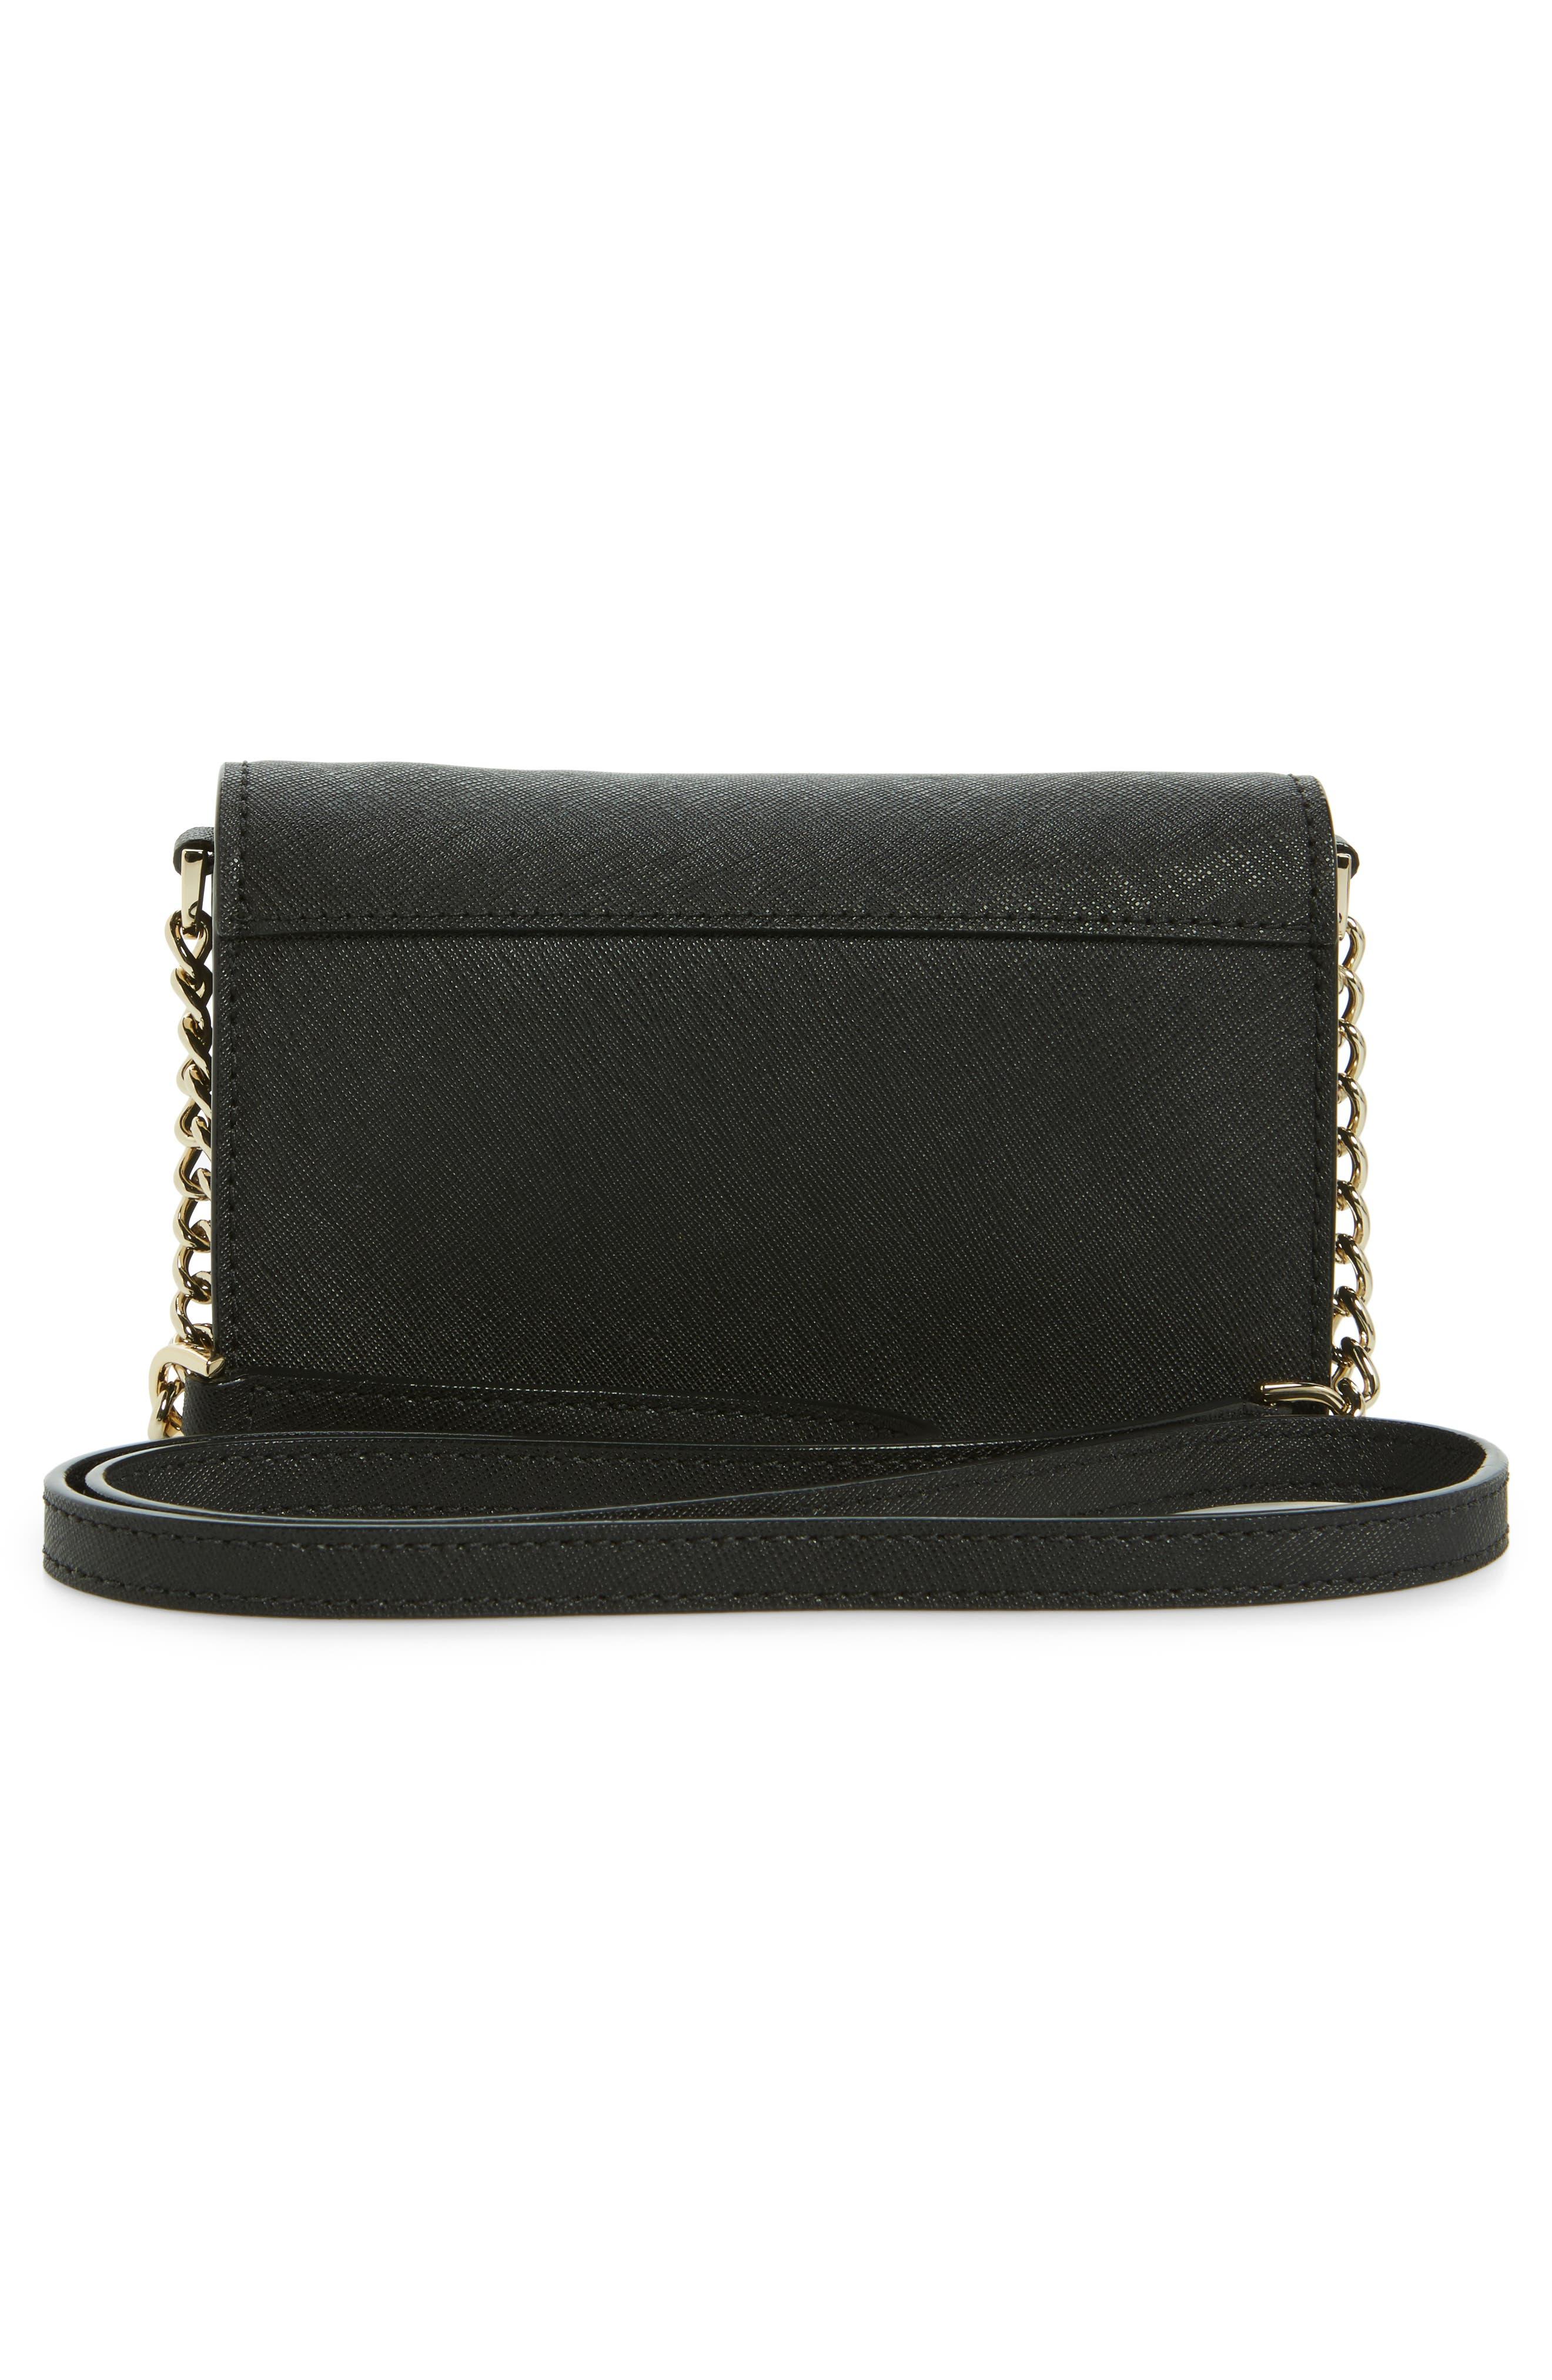 cameron street - shreya leather crossbody bag,                             Alternate thumbnail 3, color,                             001